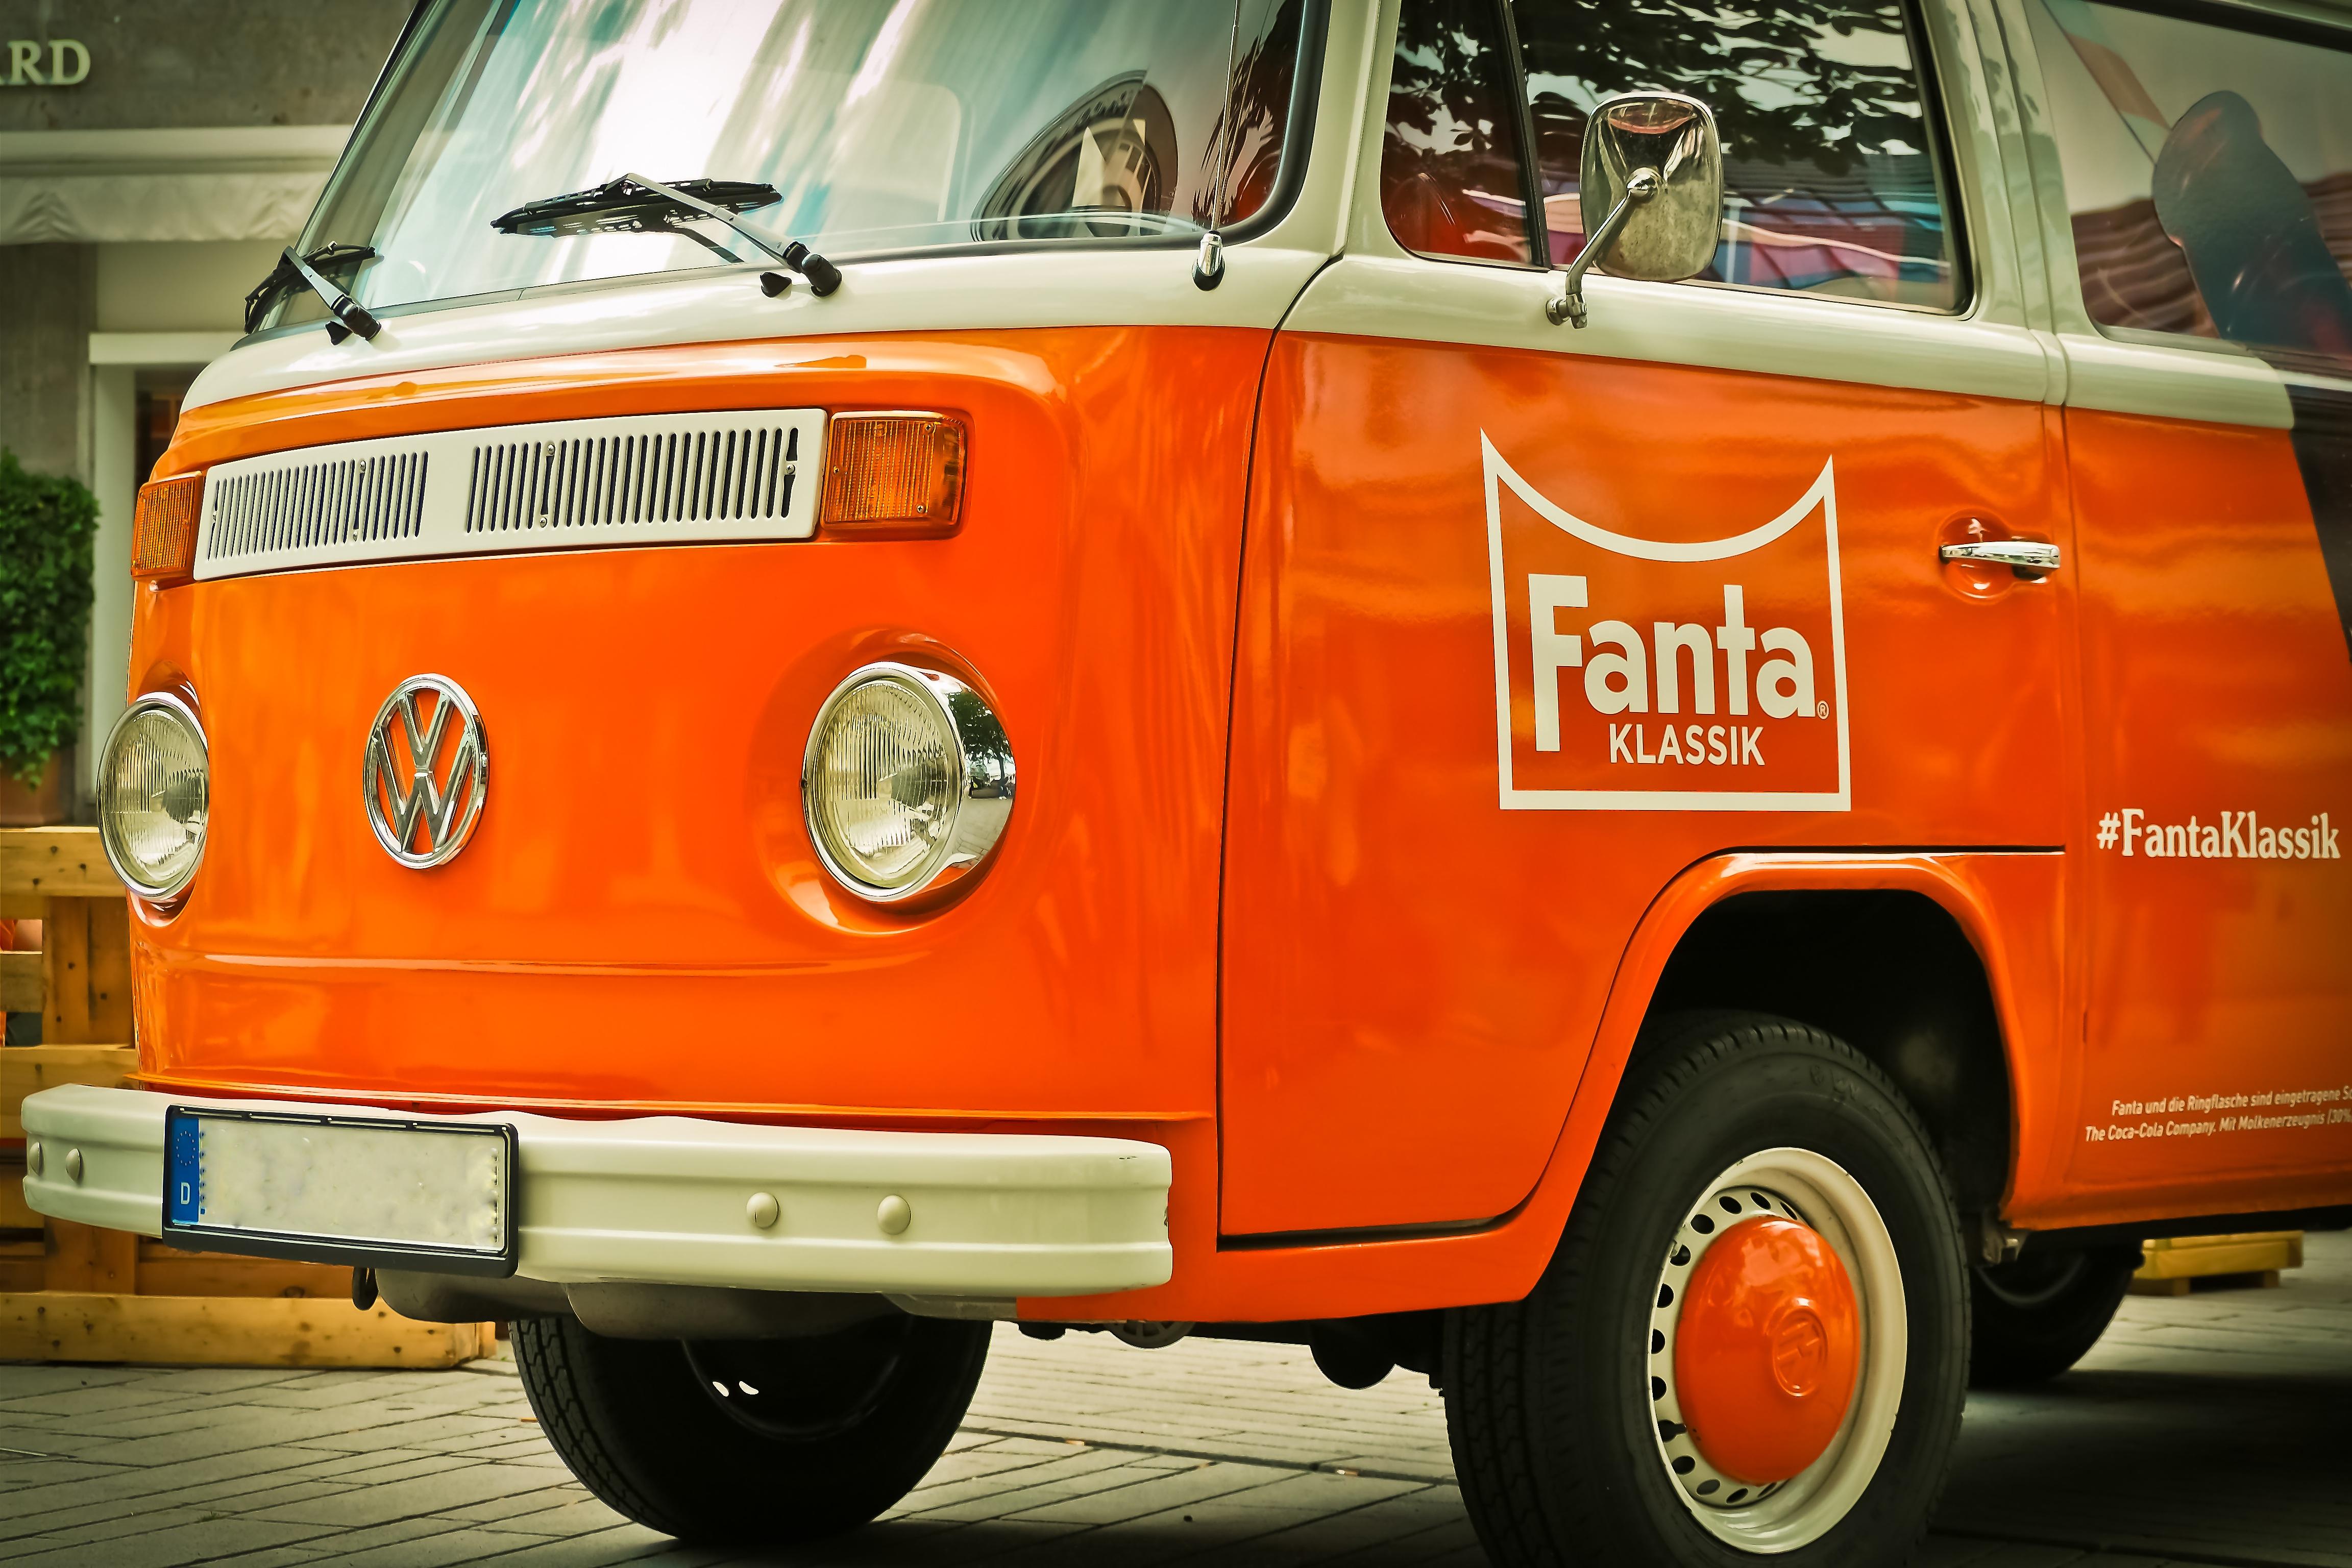 Free Images Vintage Retro Van Old Orange Auto Vw Bus